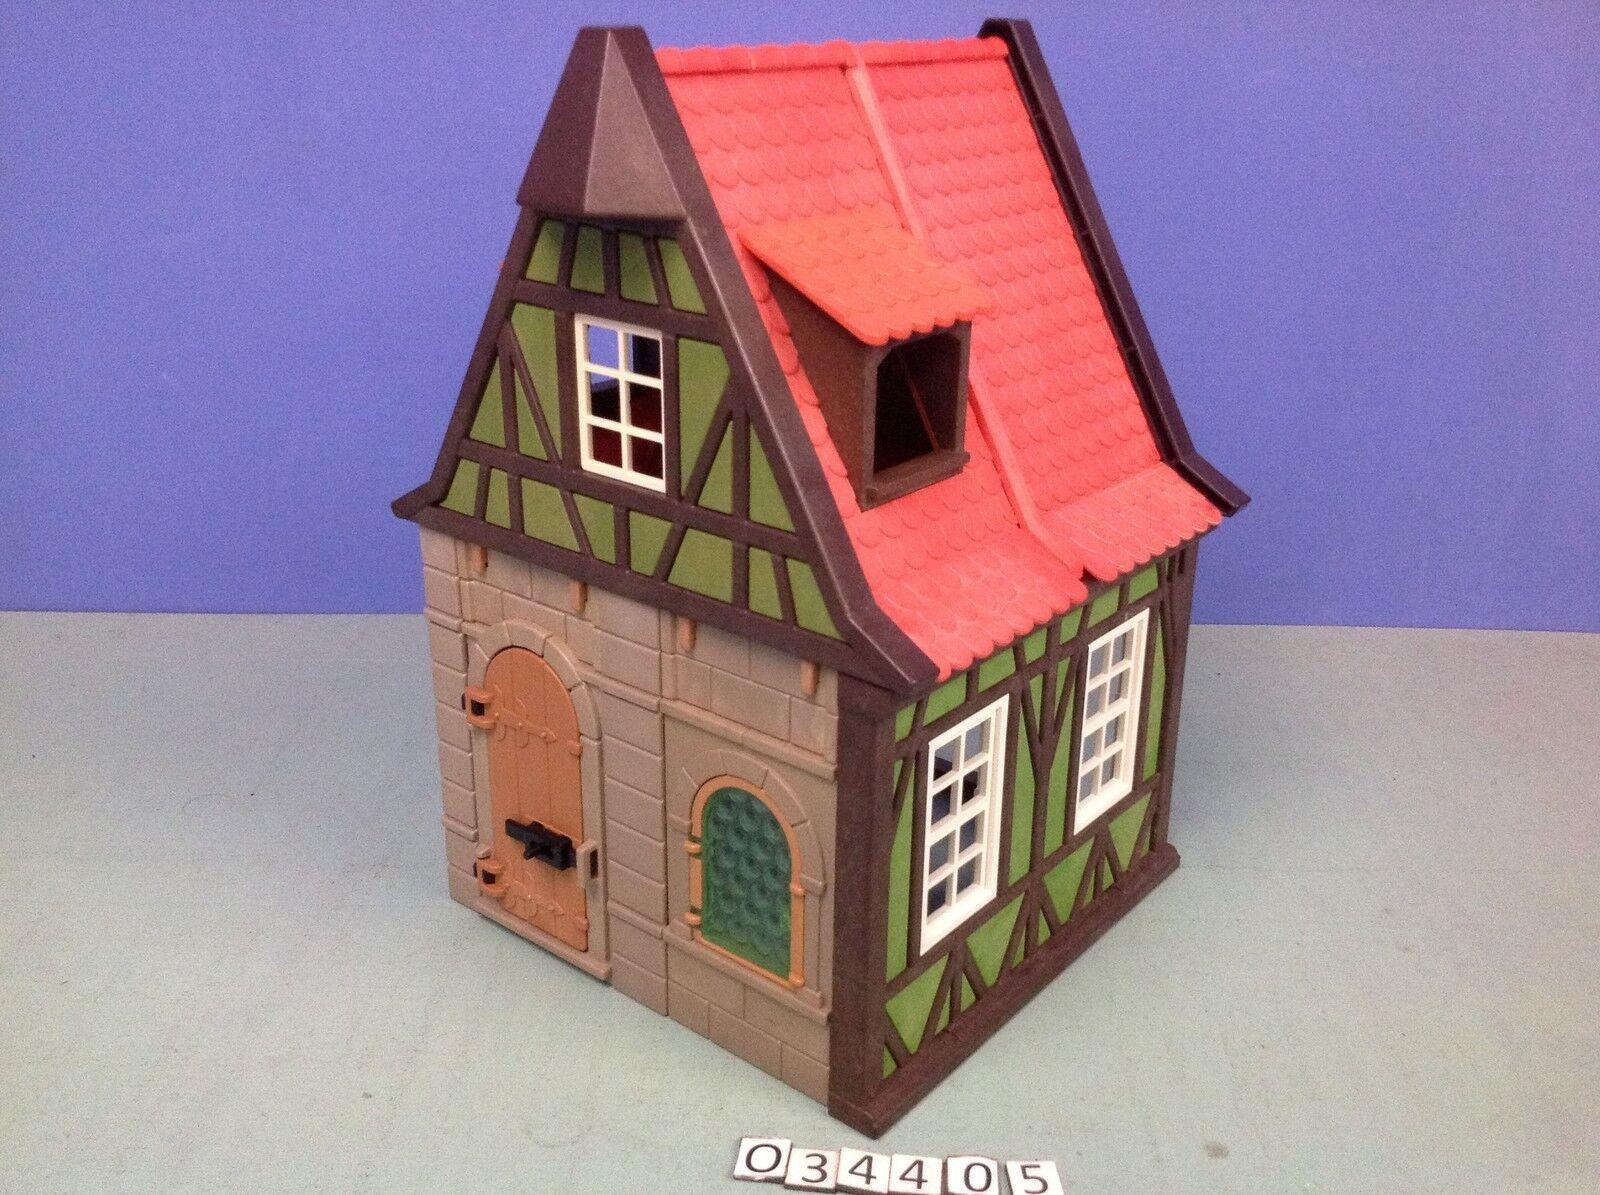 (O3440.5) playmobil maison médiévale verdee le Dimensioneur ref 3440  3666  prezzi eccellenti